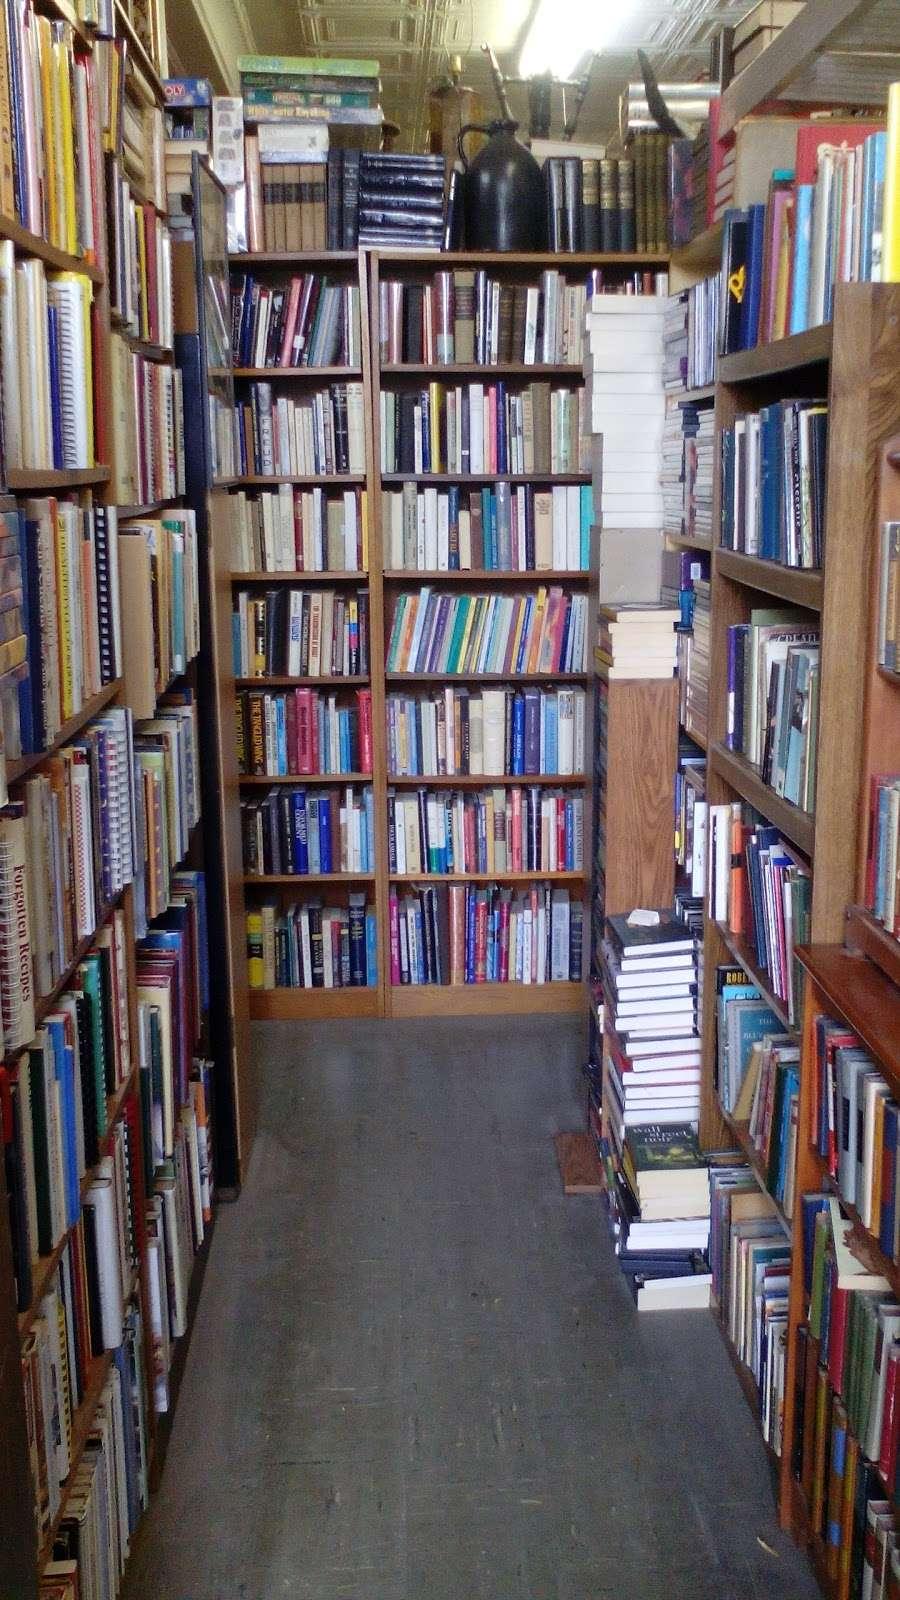 BRIER ROSE BOOKS - book store    Photo 2 of 7   Address: 450 Cedar Ln, Teaneck, NJ 07666, USA   Phone: (201) 836-5500